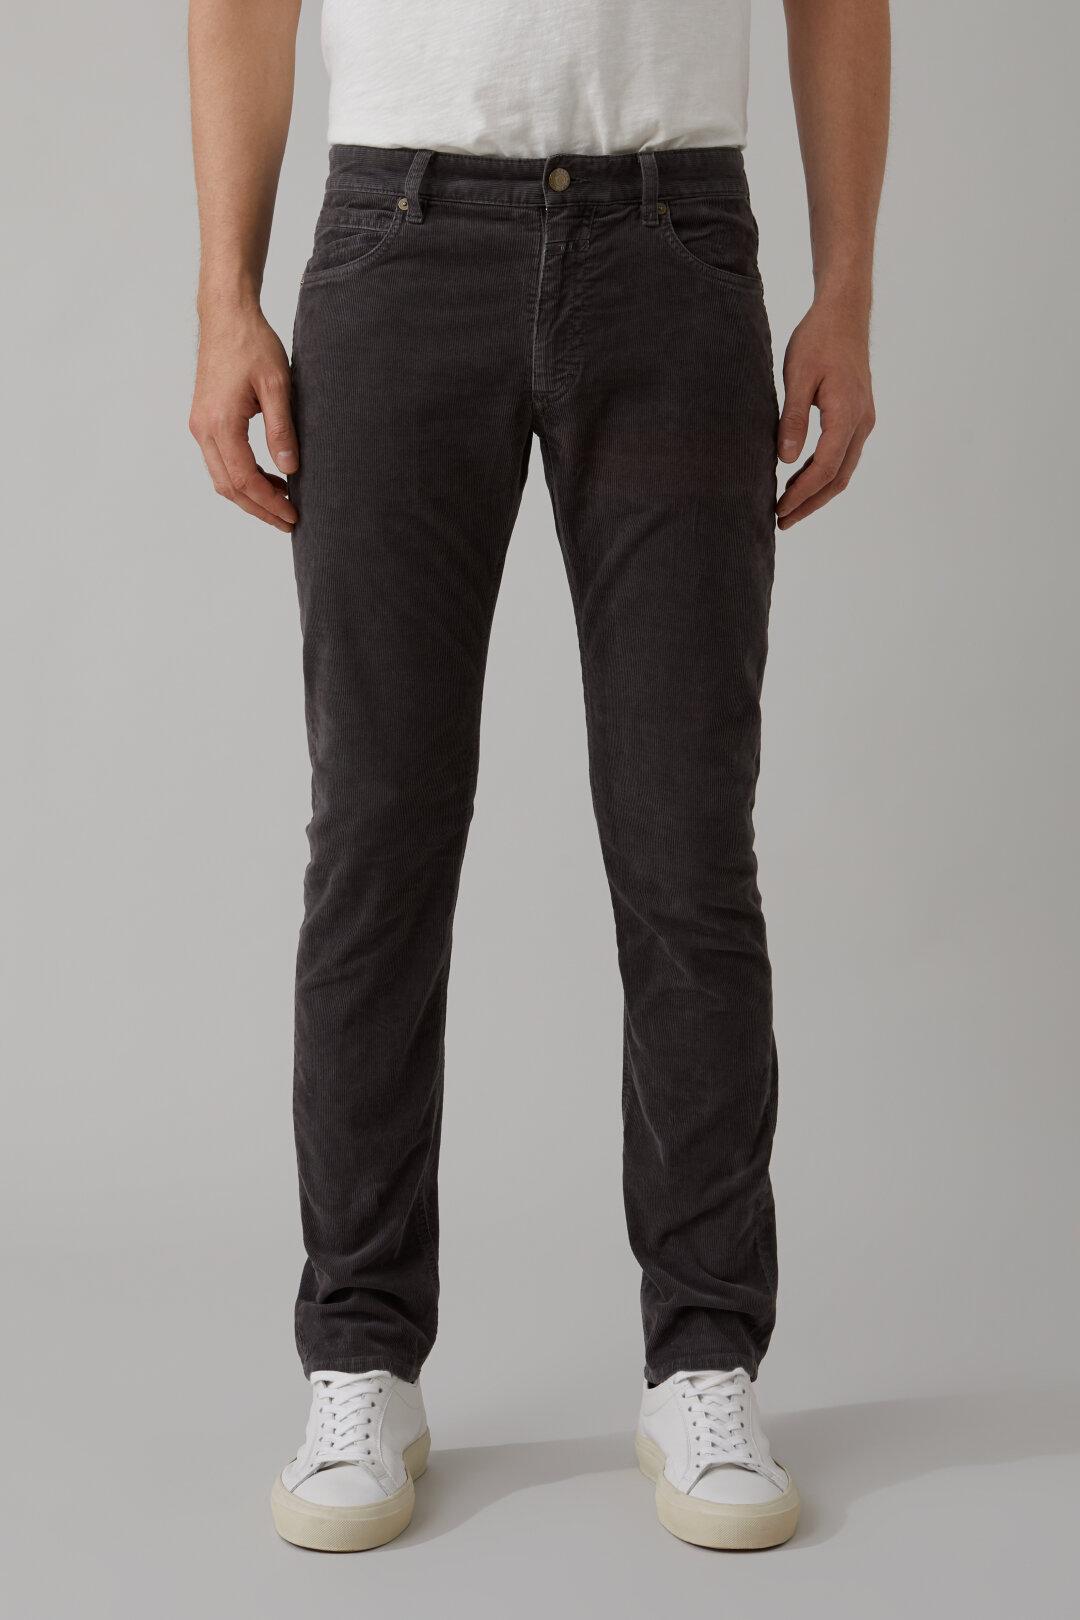 Unity Slim Corduroy Pants